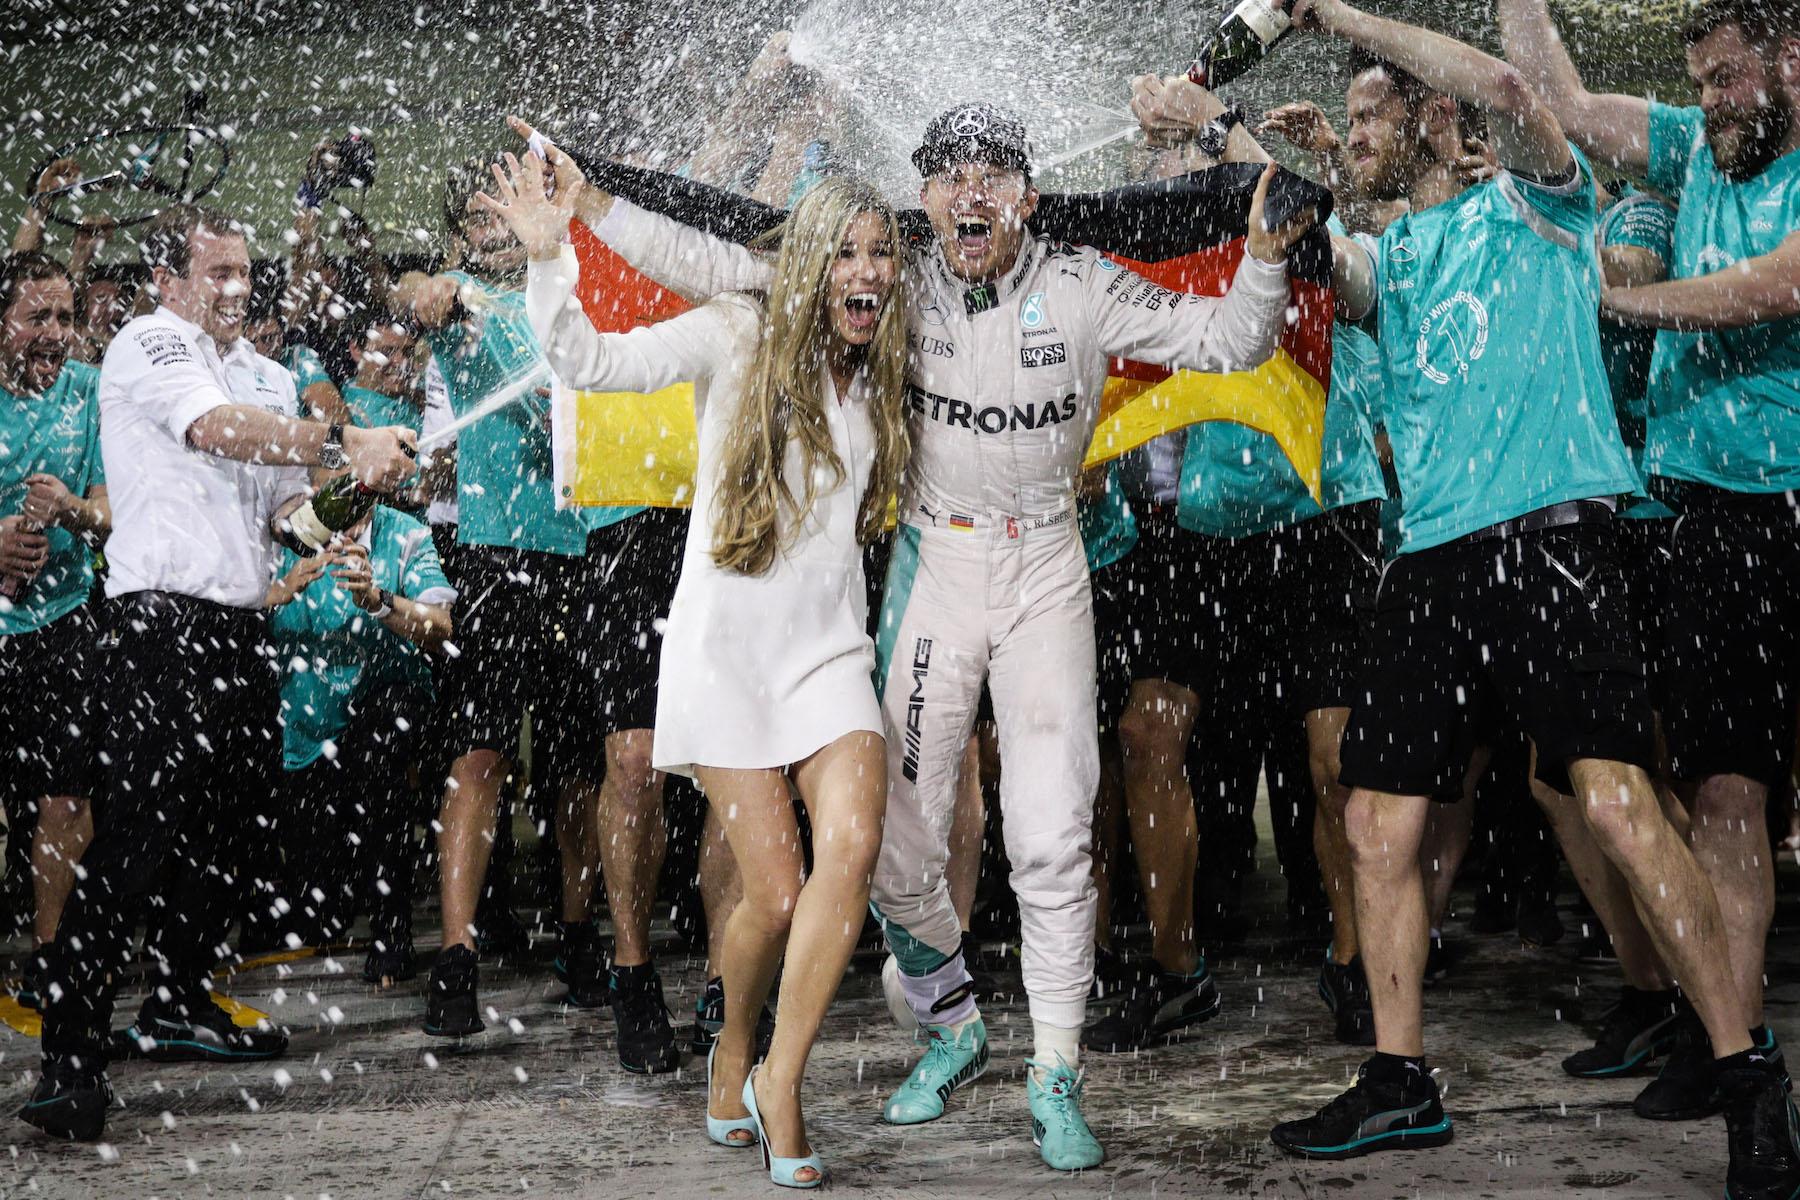 Salracing - Nico Rosberg celebrating his World title